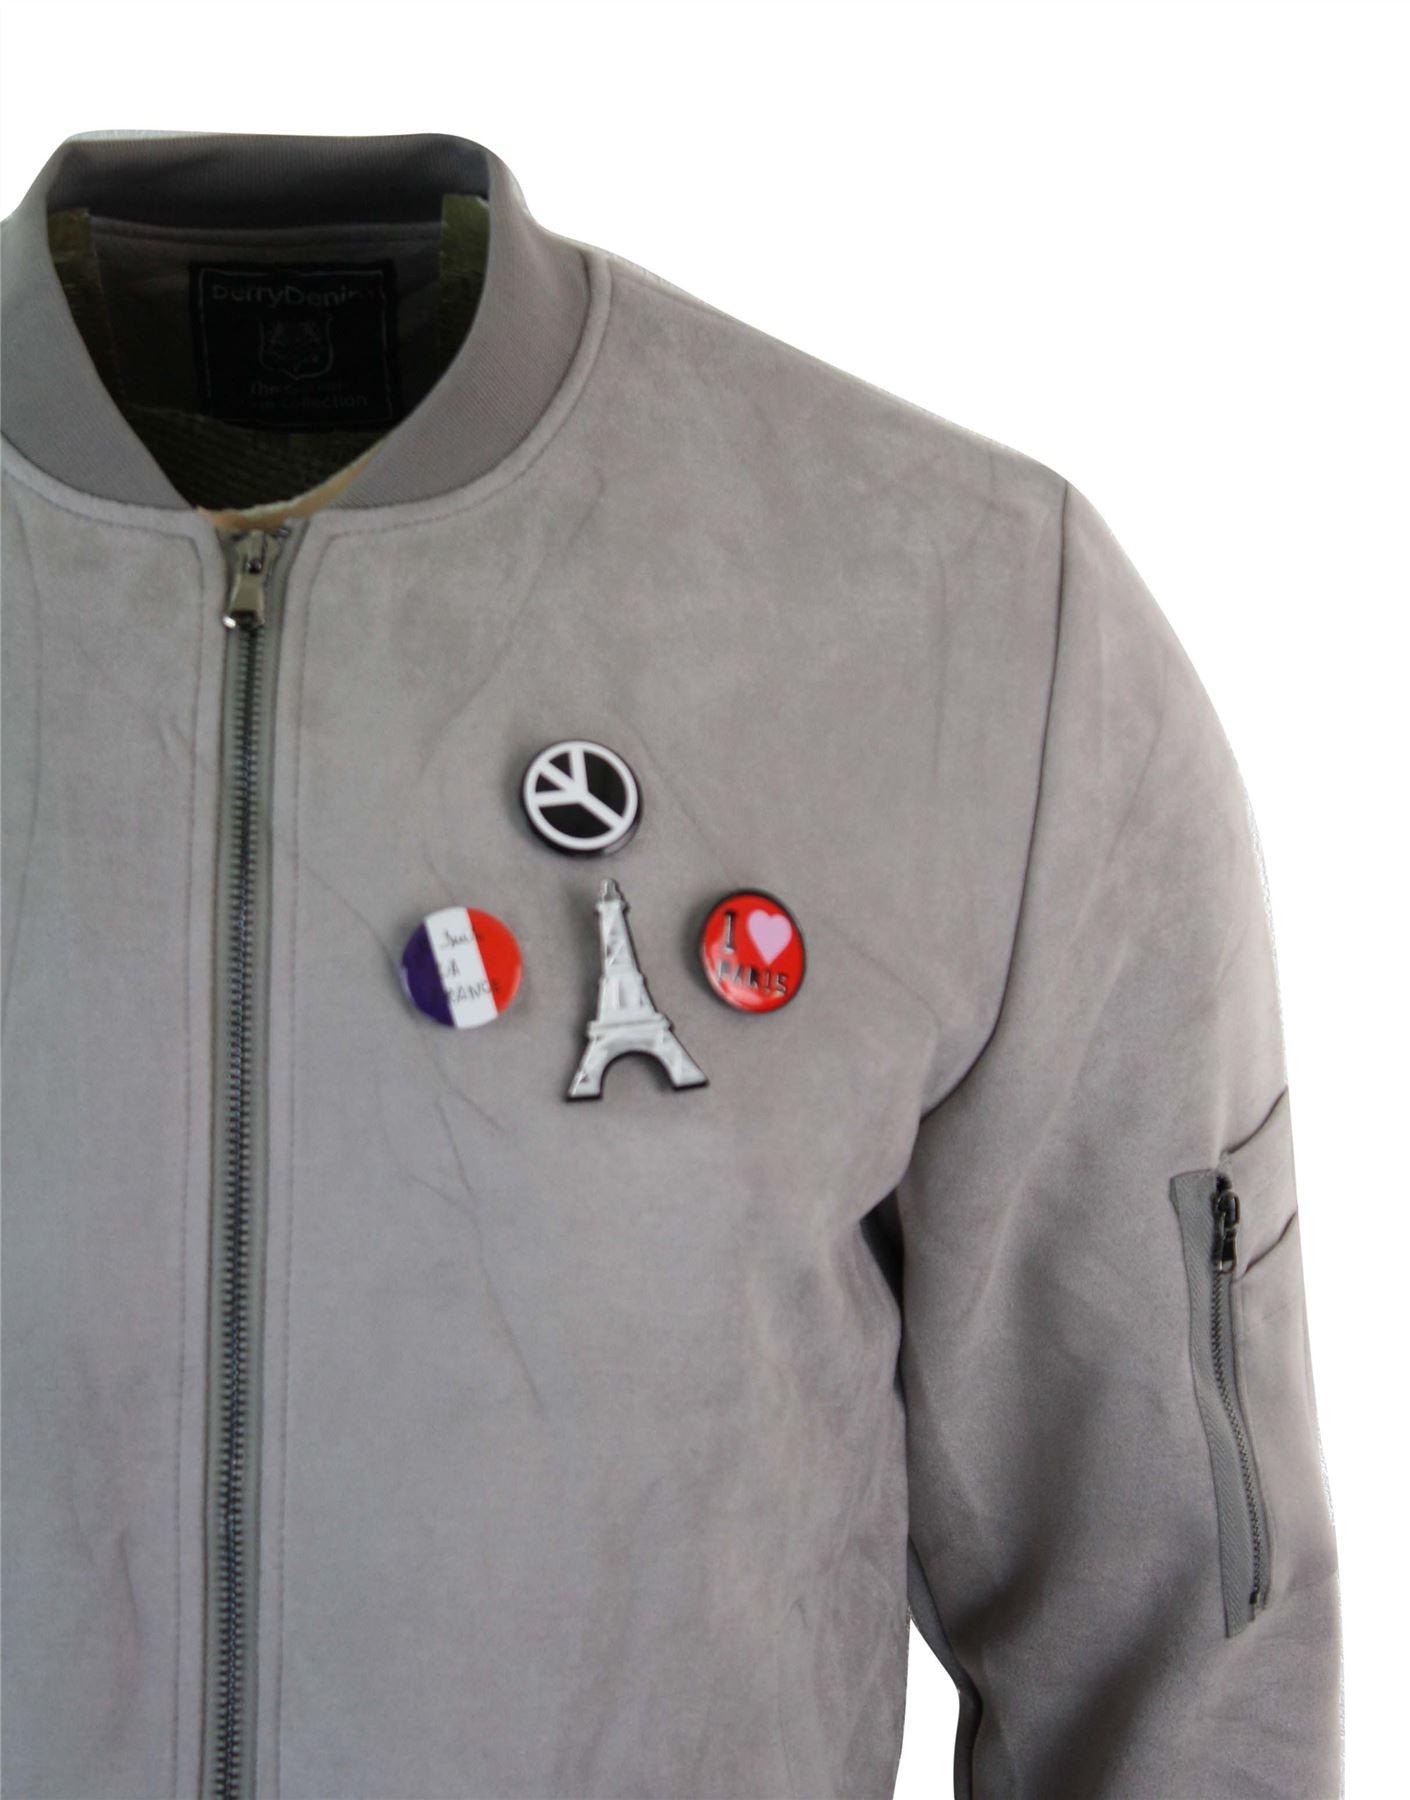 Blouson-homme-simili-daim-MA1-Bomber-retro-aviateur-badges-coupe-ajustee